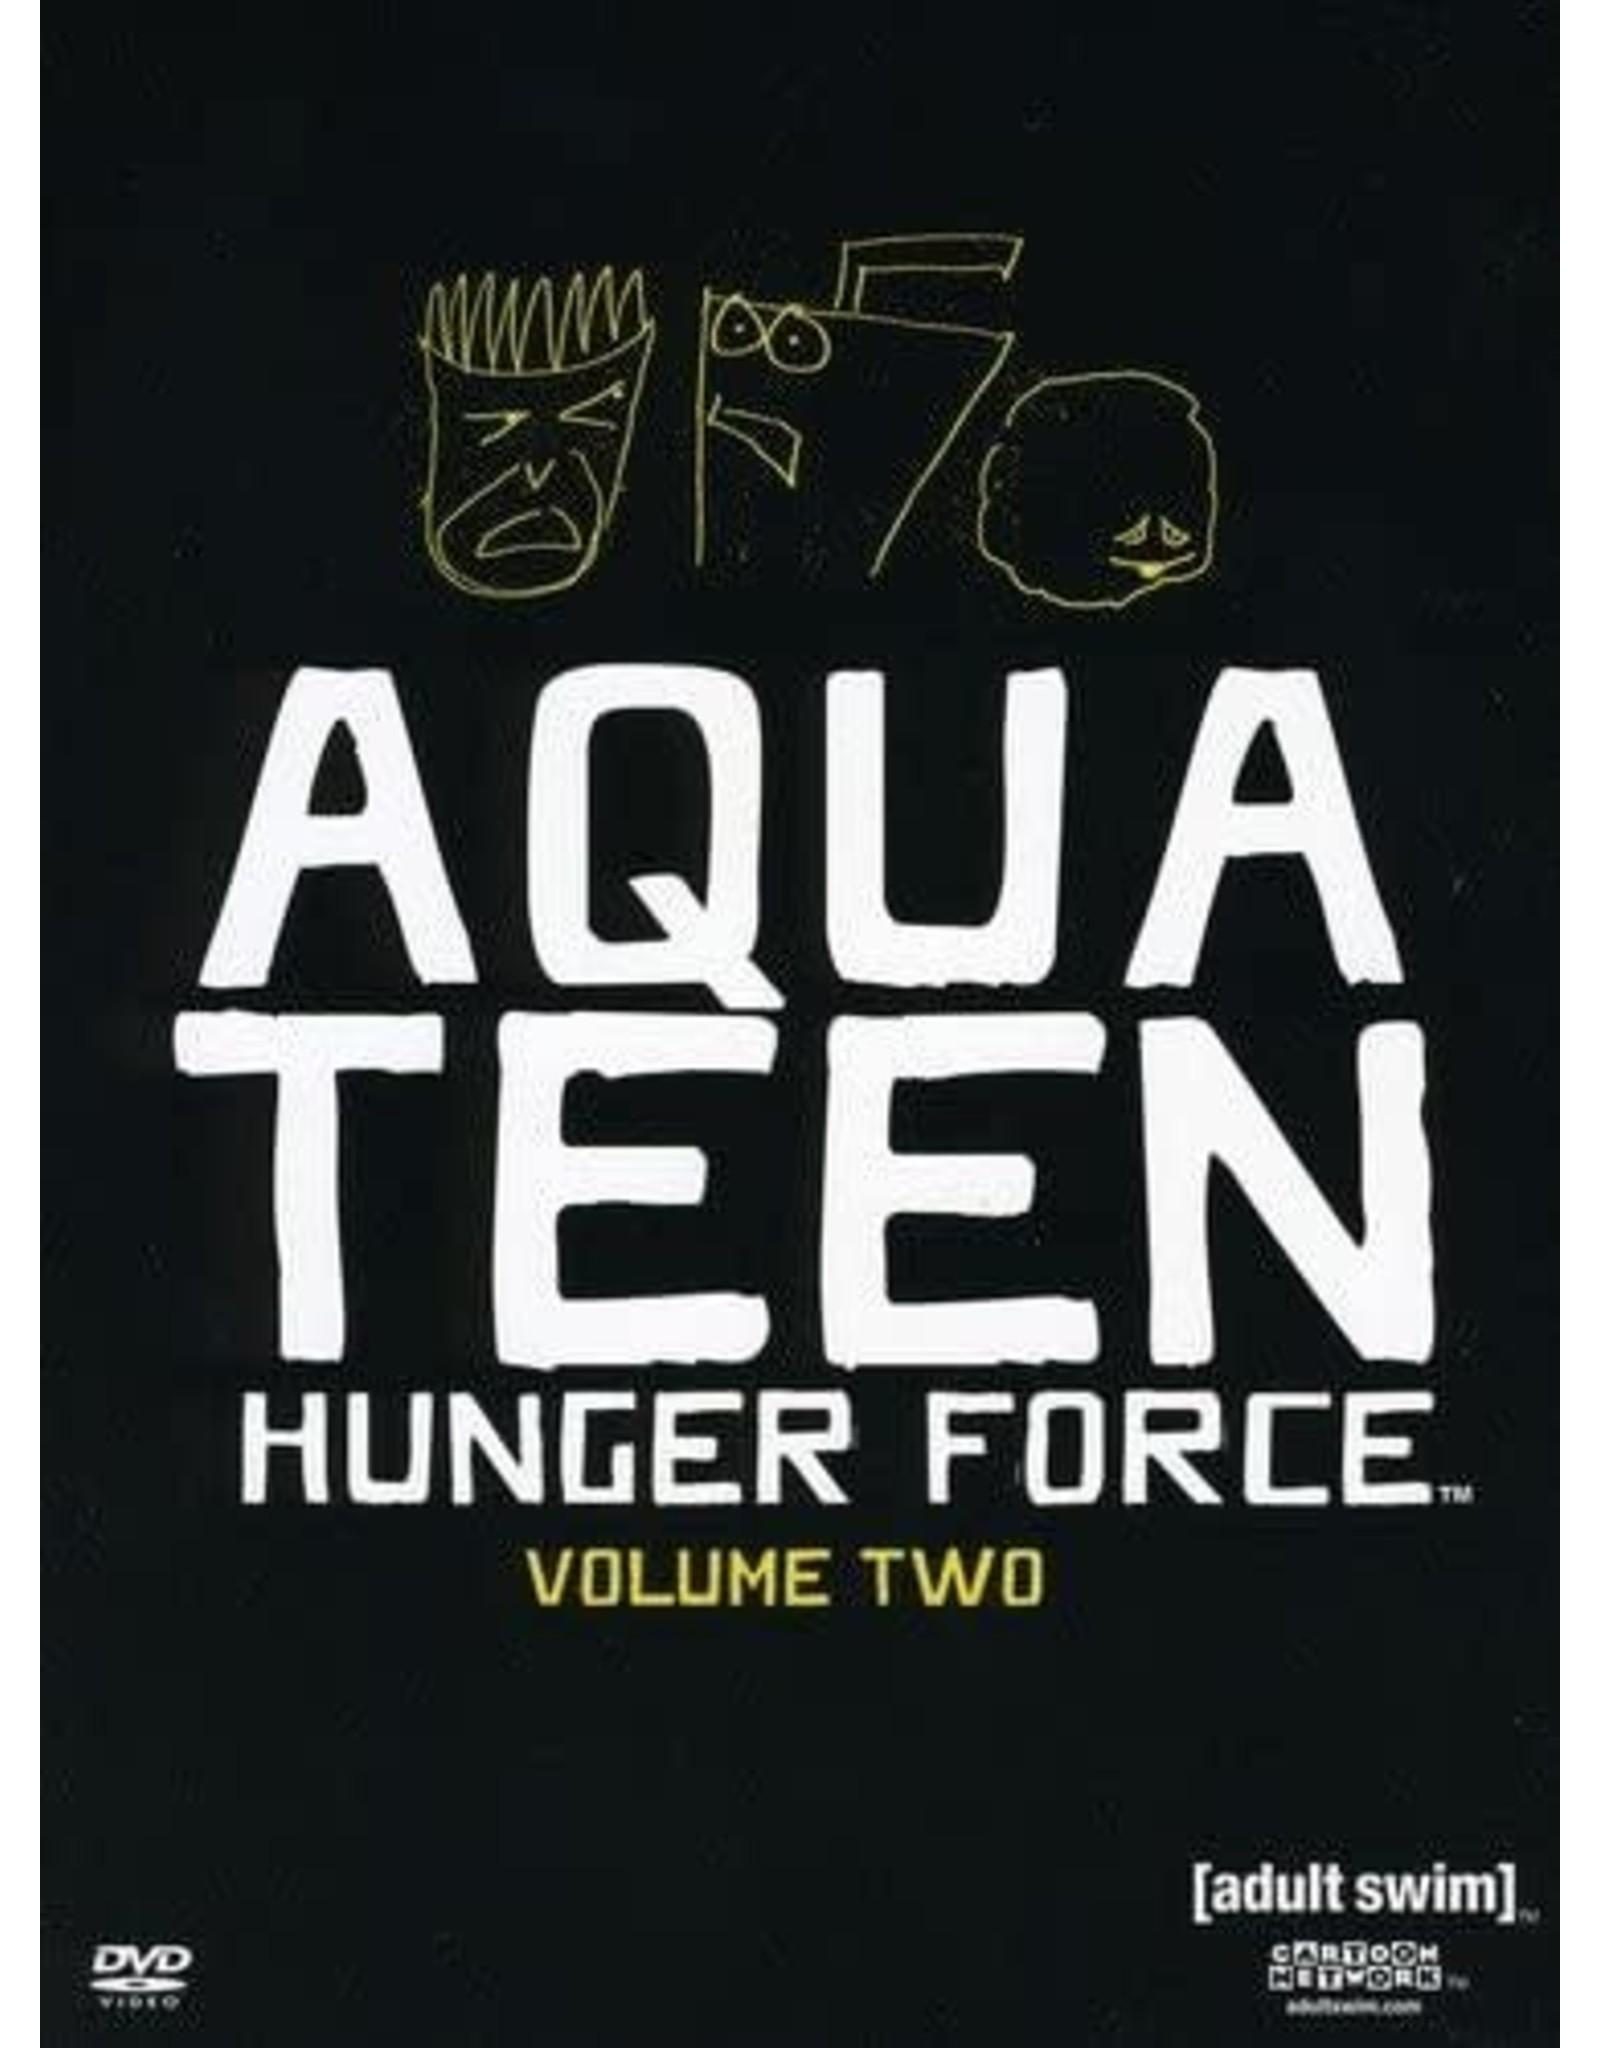 Animated Aqua Teen Hunger Force Volume Two